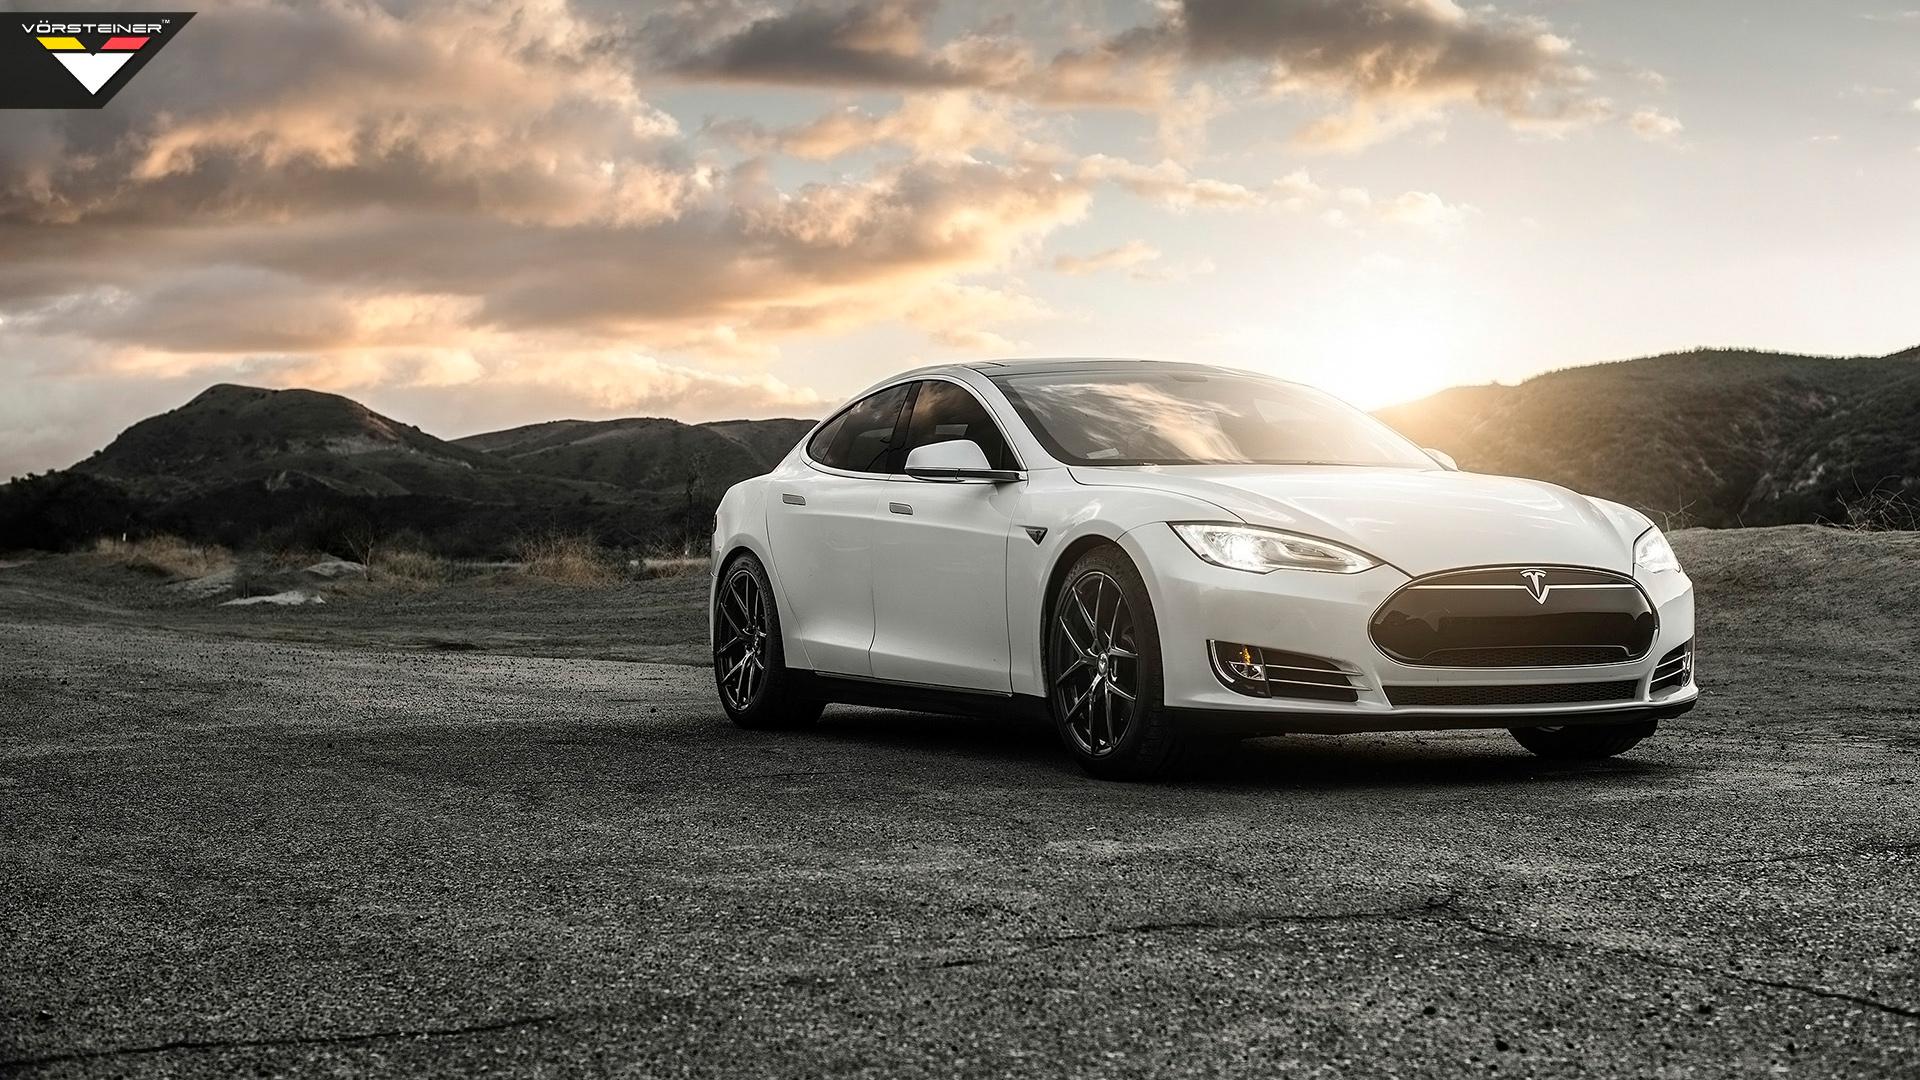 4927 views 2014 Vorsteiner Tesla Model S P85